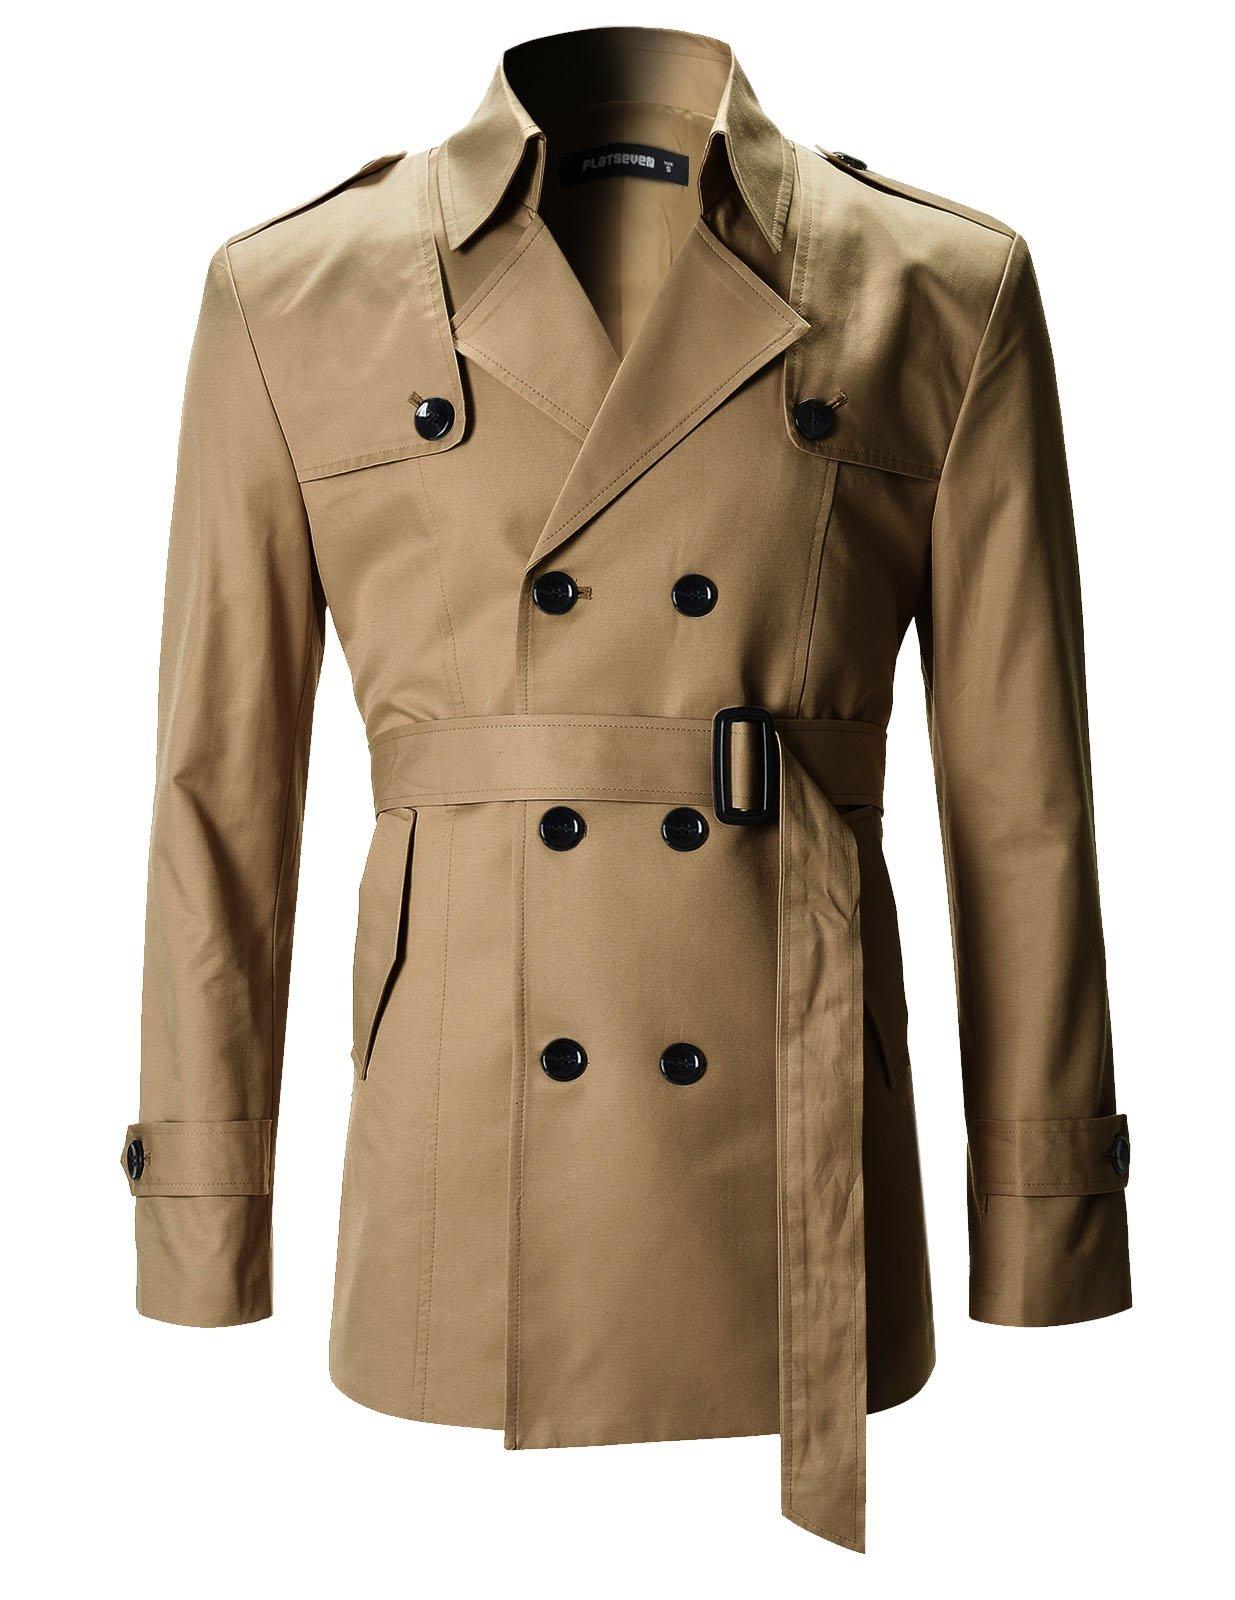 FLATSEVEN Mens Slim Fit Designer Casual Trench Coat (FCT201) Dark Beige, Size XL